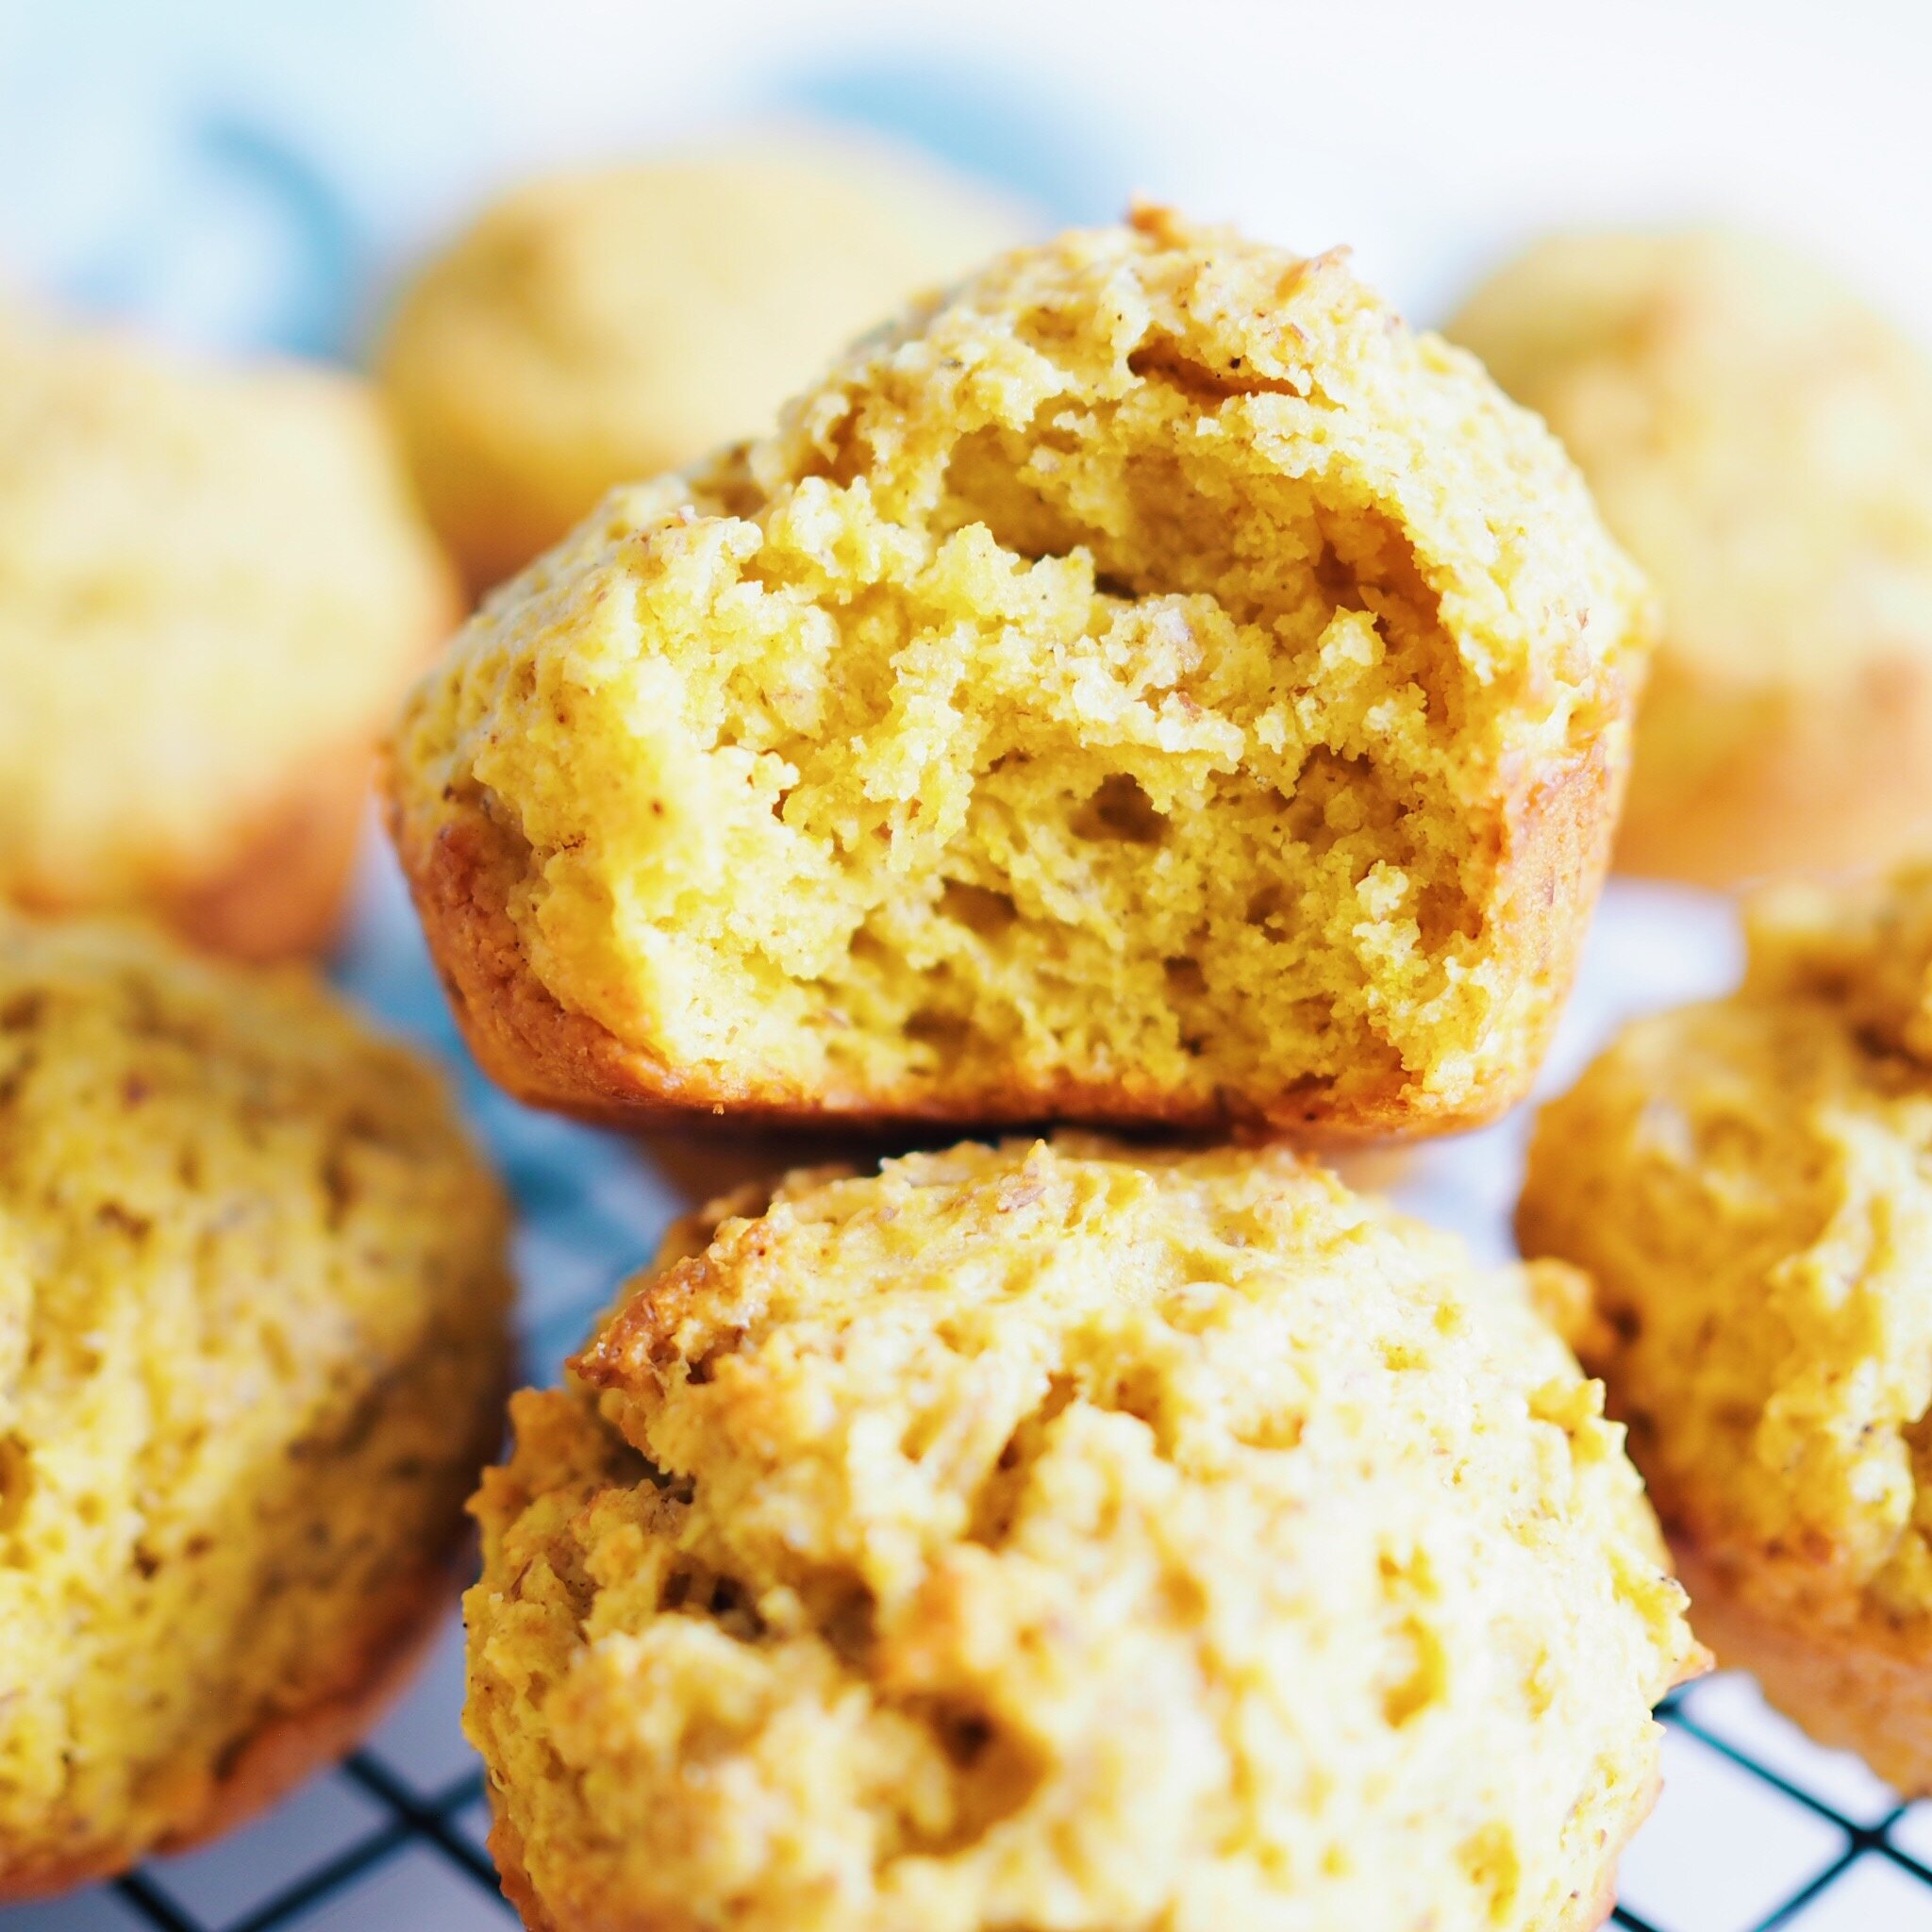 Healthy Lemon Turmeric Muffins